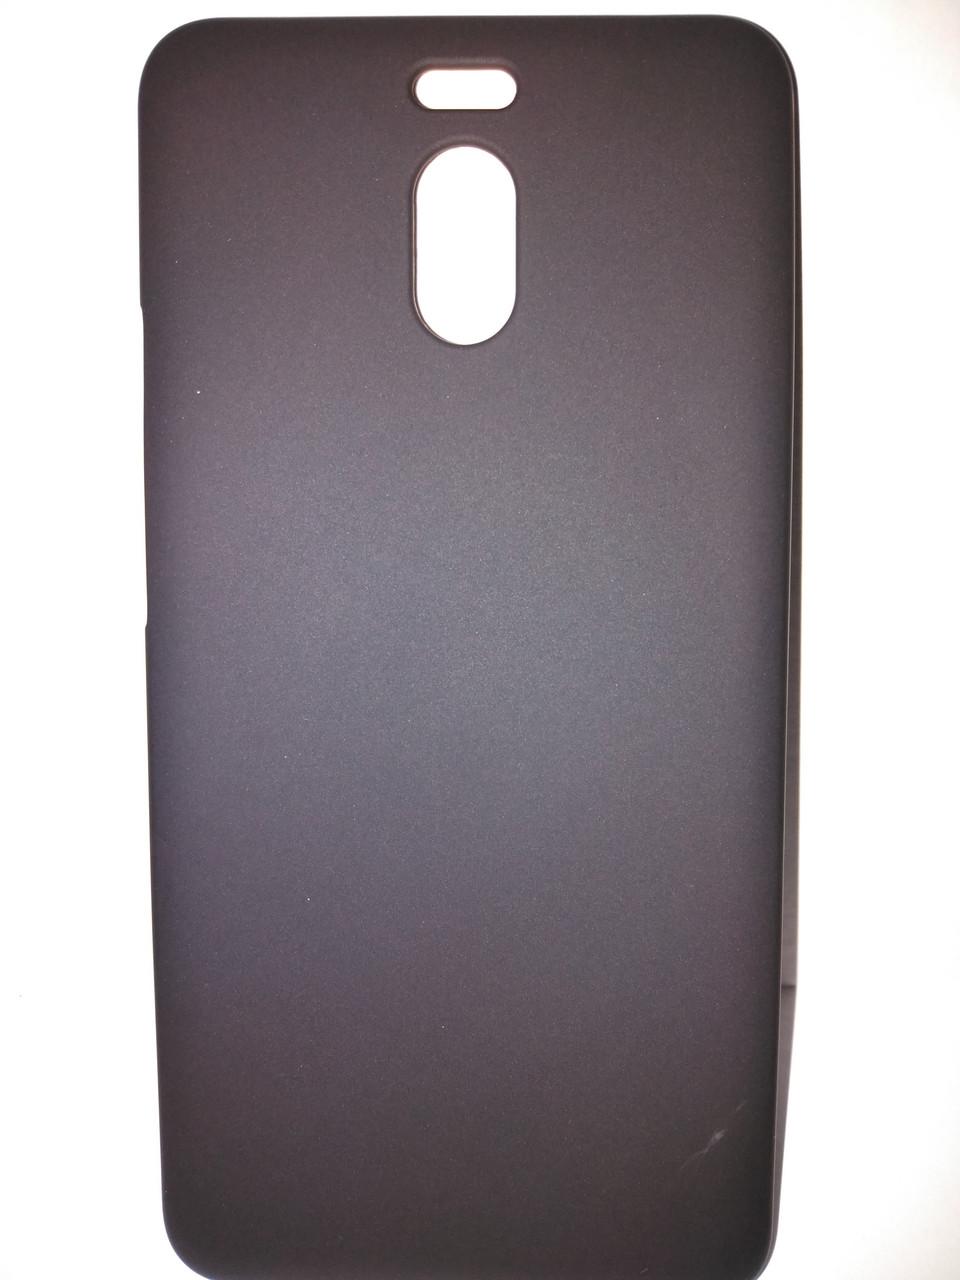 Чохол бампер силіконовий для Meizu M6 Note. Чорний